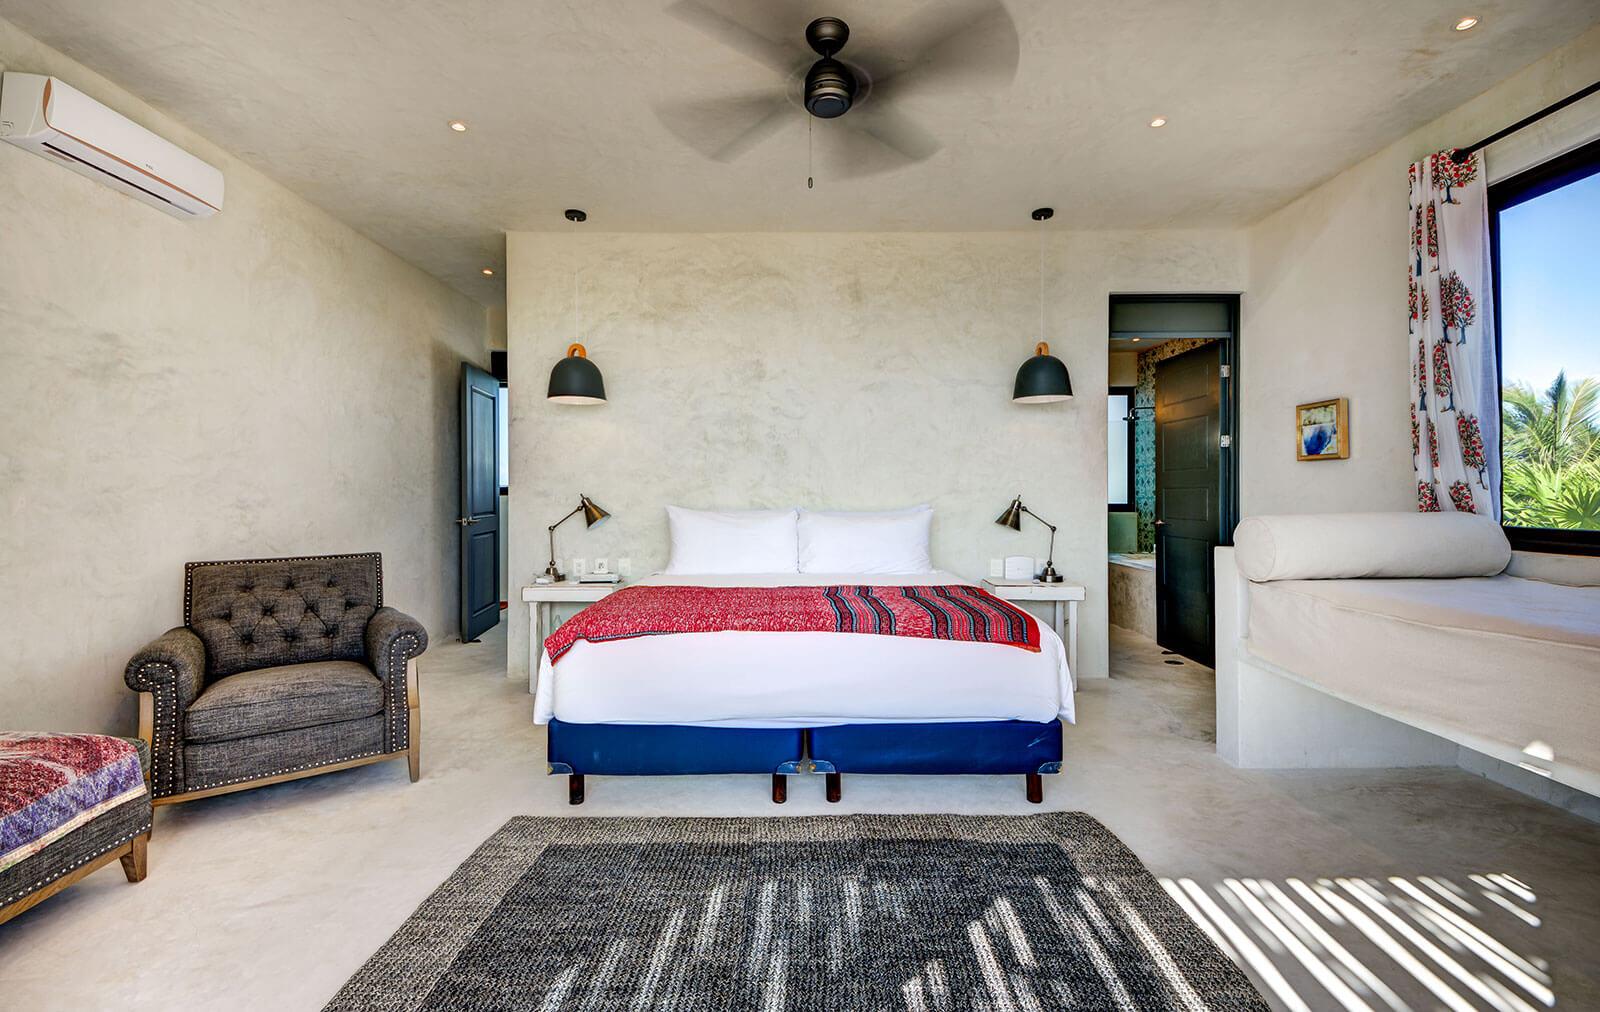 Maya_Luxe_Riviera_Maya_Luxury_Villas_Experiences_Tulum_Soliman_Bay_5_Bedrooms_22.jpg